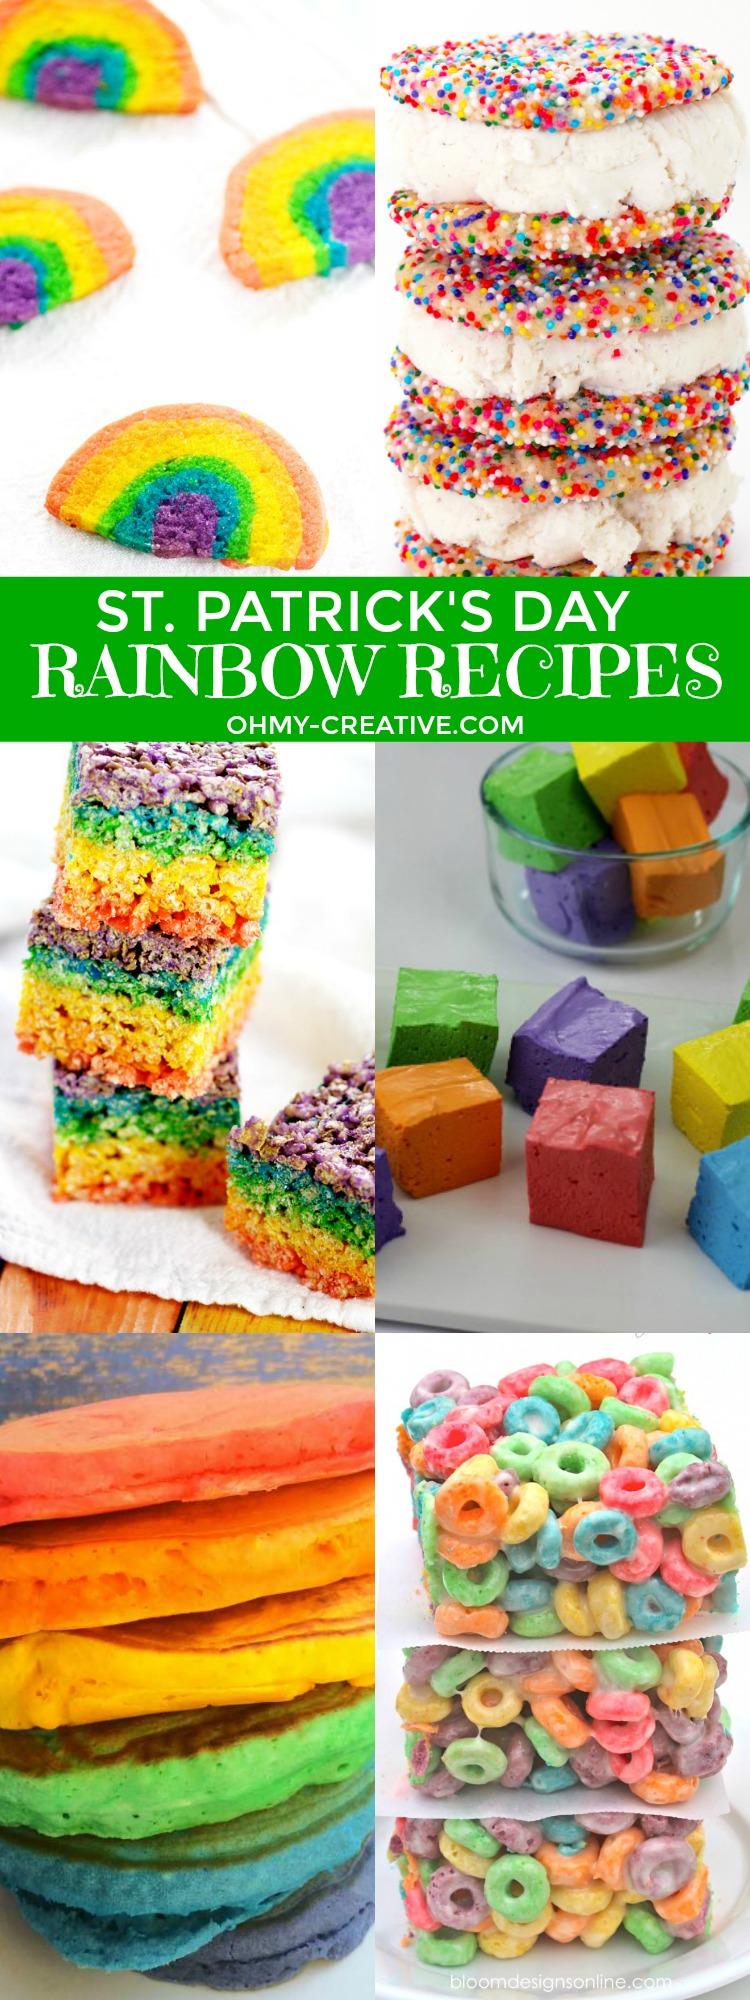 How to make rainbow food with these Rad Rainbow Recipes! Fun for Rainbow Party Themes or St. Patrick's Day | OHMY-CREATIVE.COM | Rice Krispie Treats | Homemade Marshmallows | Lucky Charms | Rainbow Pancakes | Rainbow Food | Rainbow Sprinkles